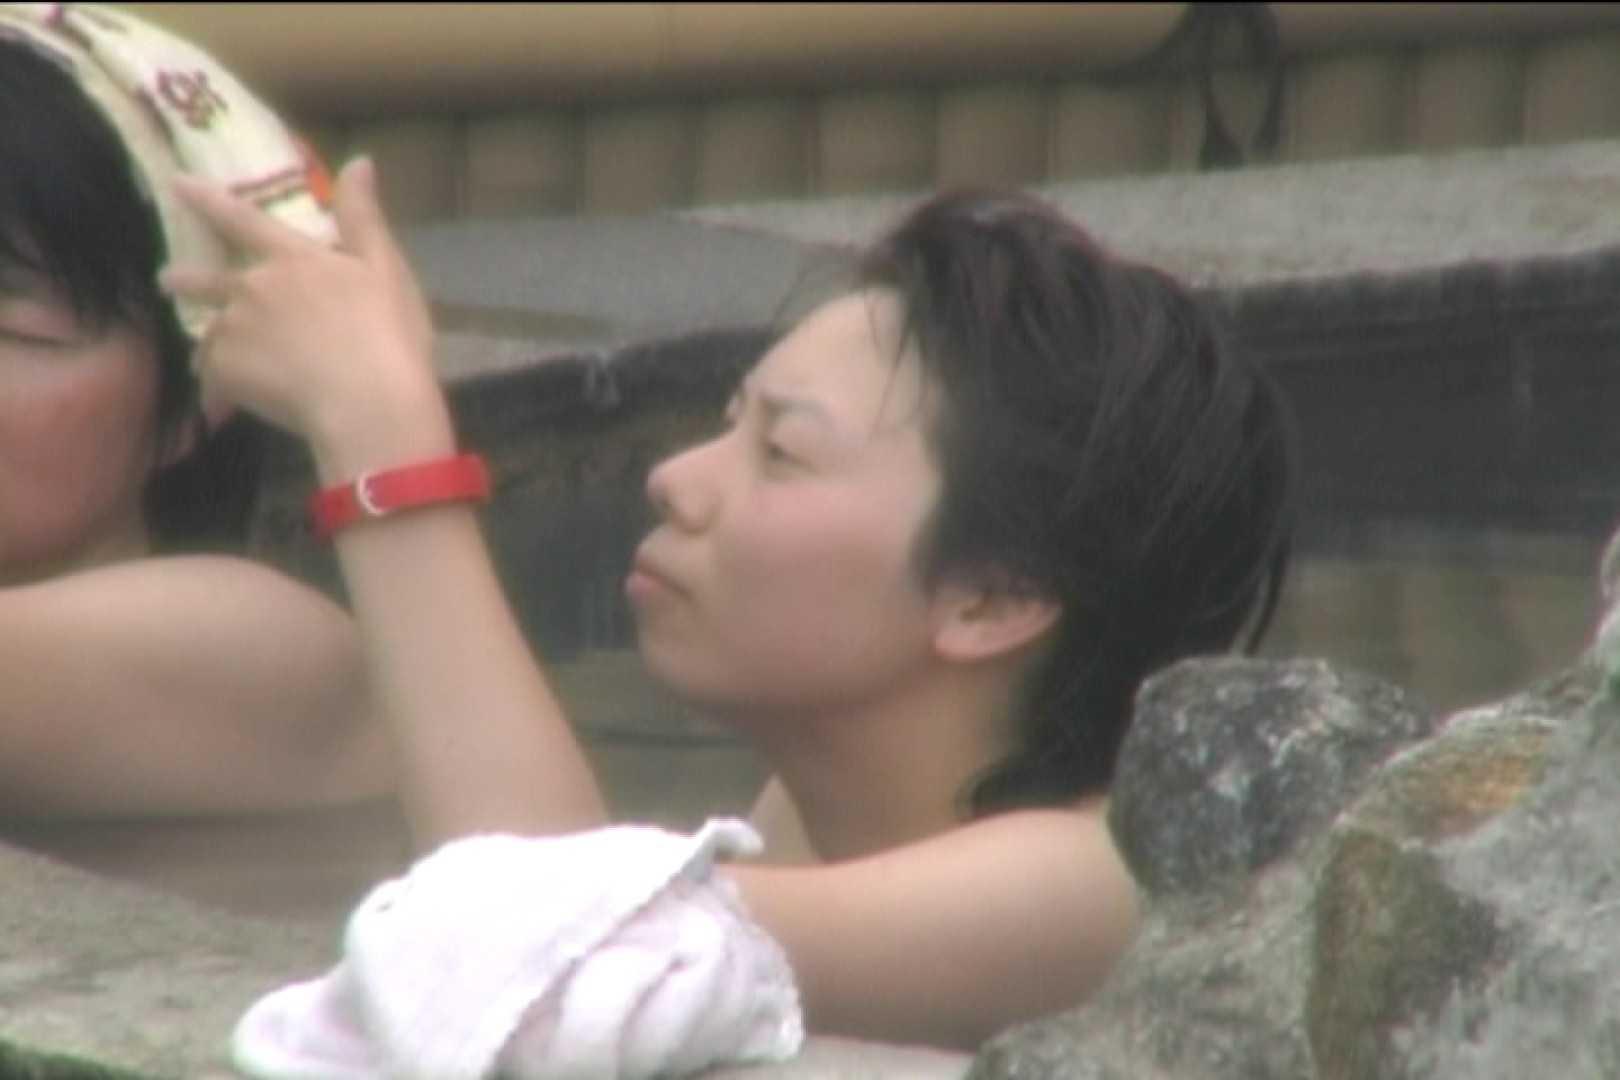 Aquaな露天風呂Vol.122 エッチな盗撮 オメコ無修正動画無料 107pic 98